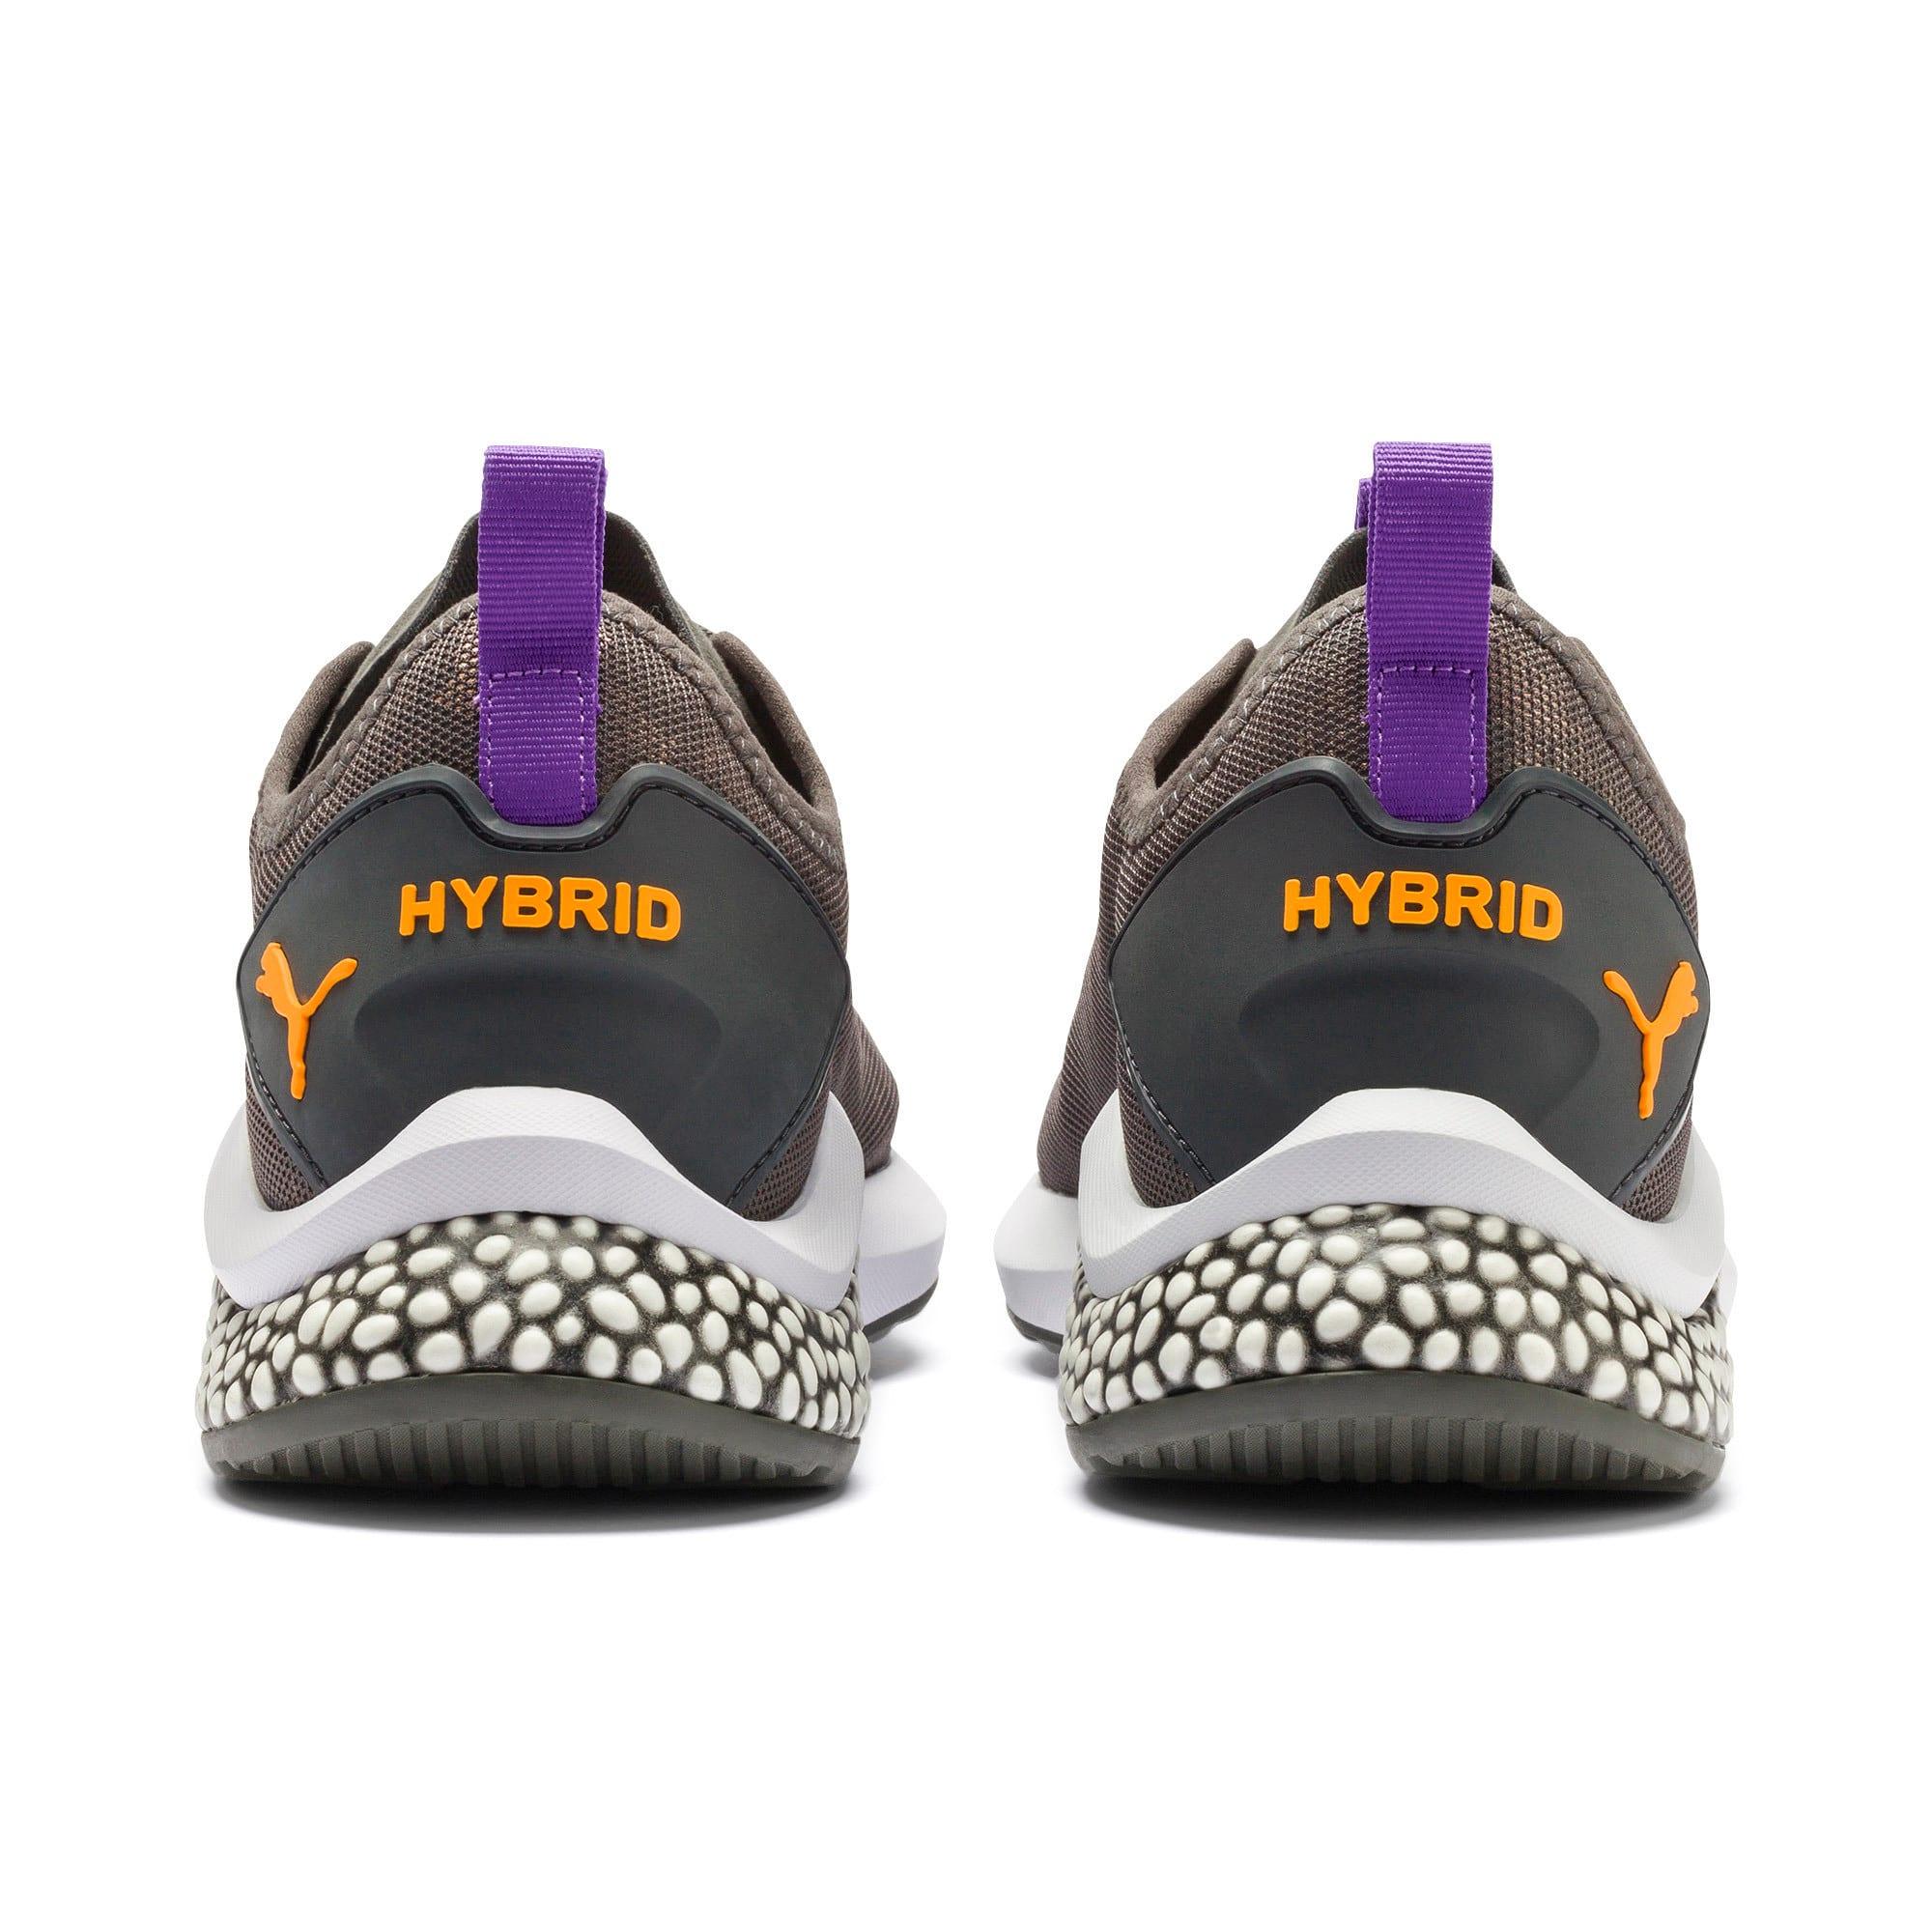 Thumbnail 5 of HYBRID NX Rave Men's Running Shoes, CASTLEROCK-Purple-Orange, medium